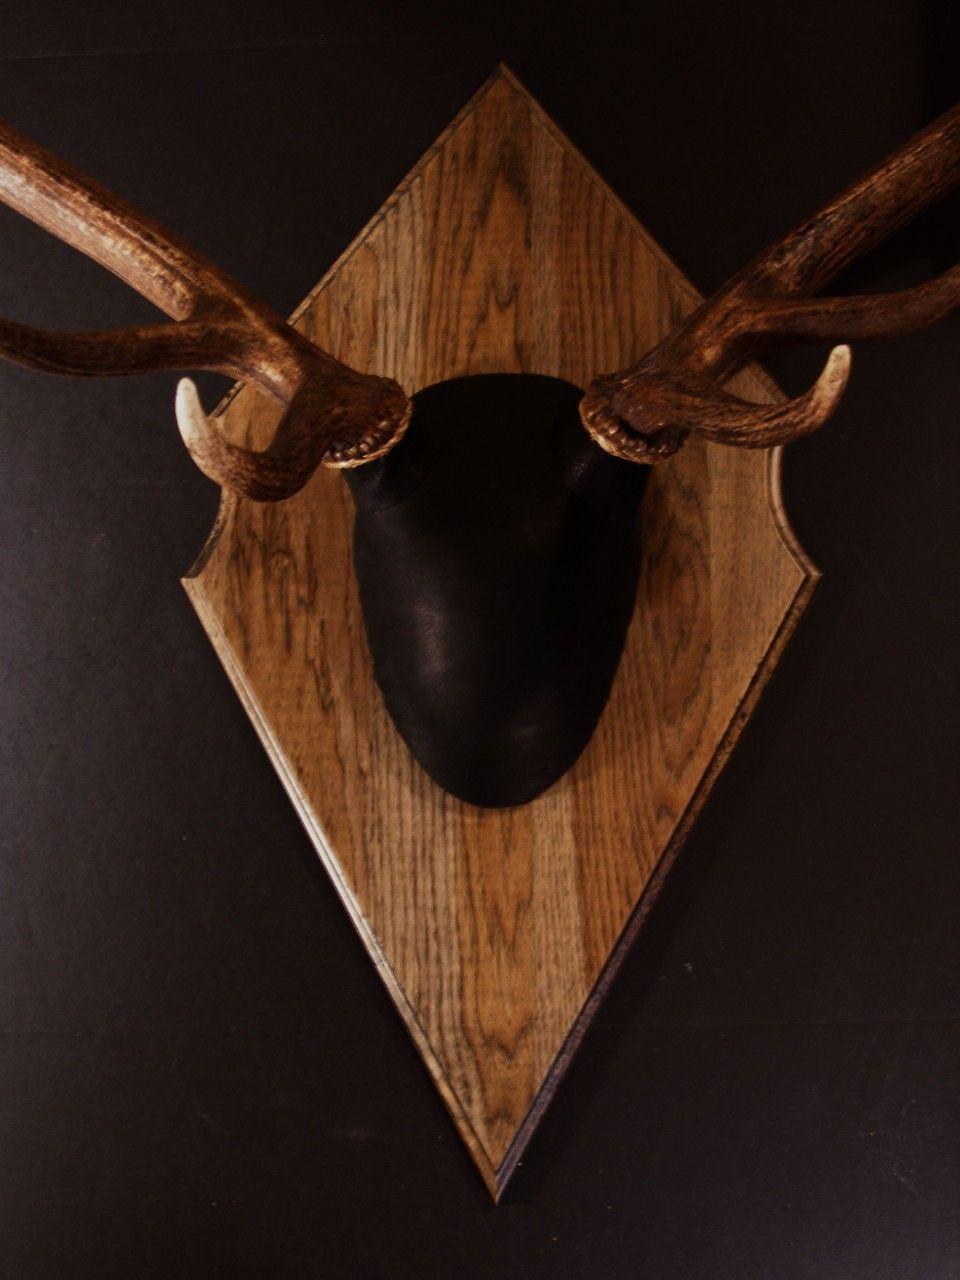 Antler Mount Kit- Outfitter Elk in 2020 | Antler mount ...